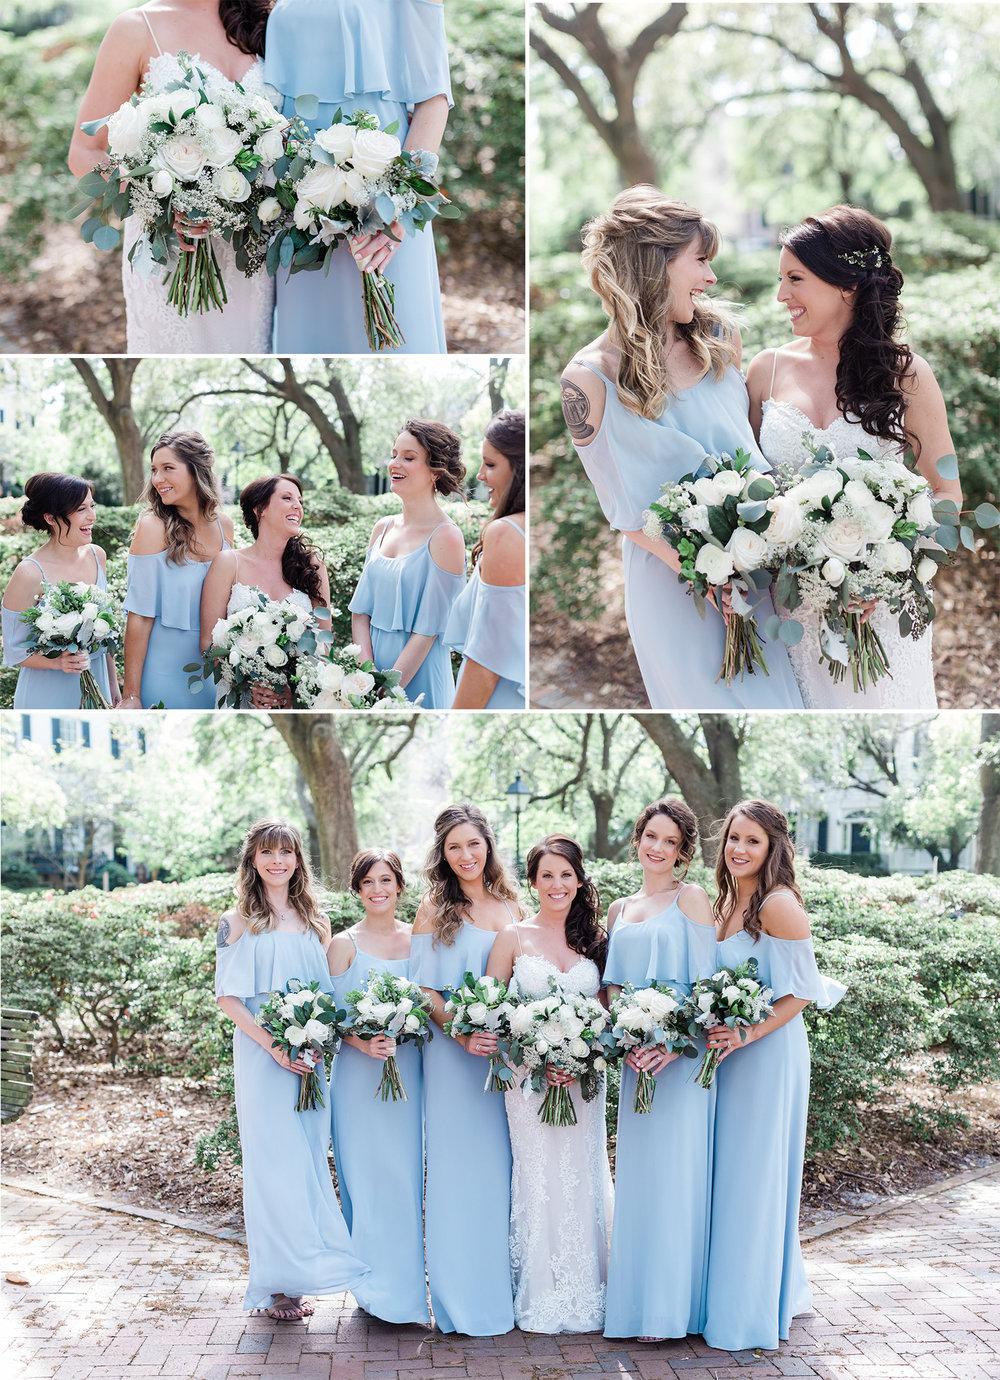 Michelle + Scott - Intimate Savannah Wedding at Soho South Cafe, soft blue bridesmaids dresses | Apt. B Photography